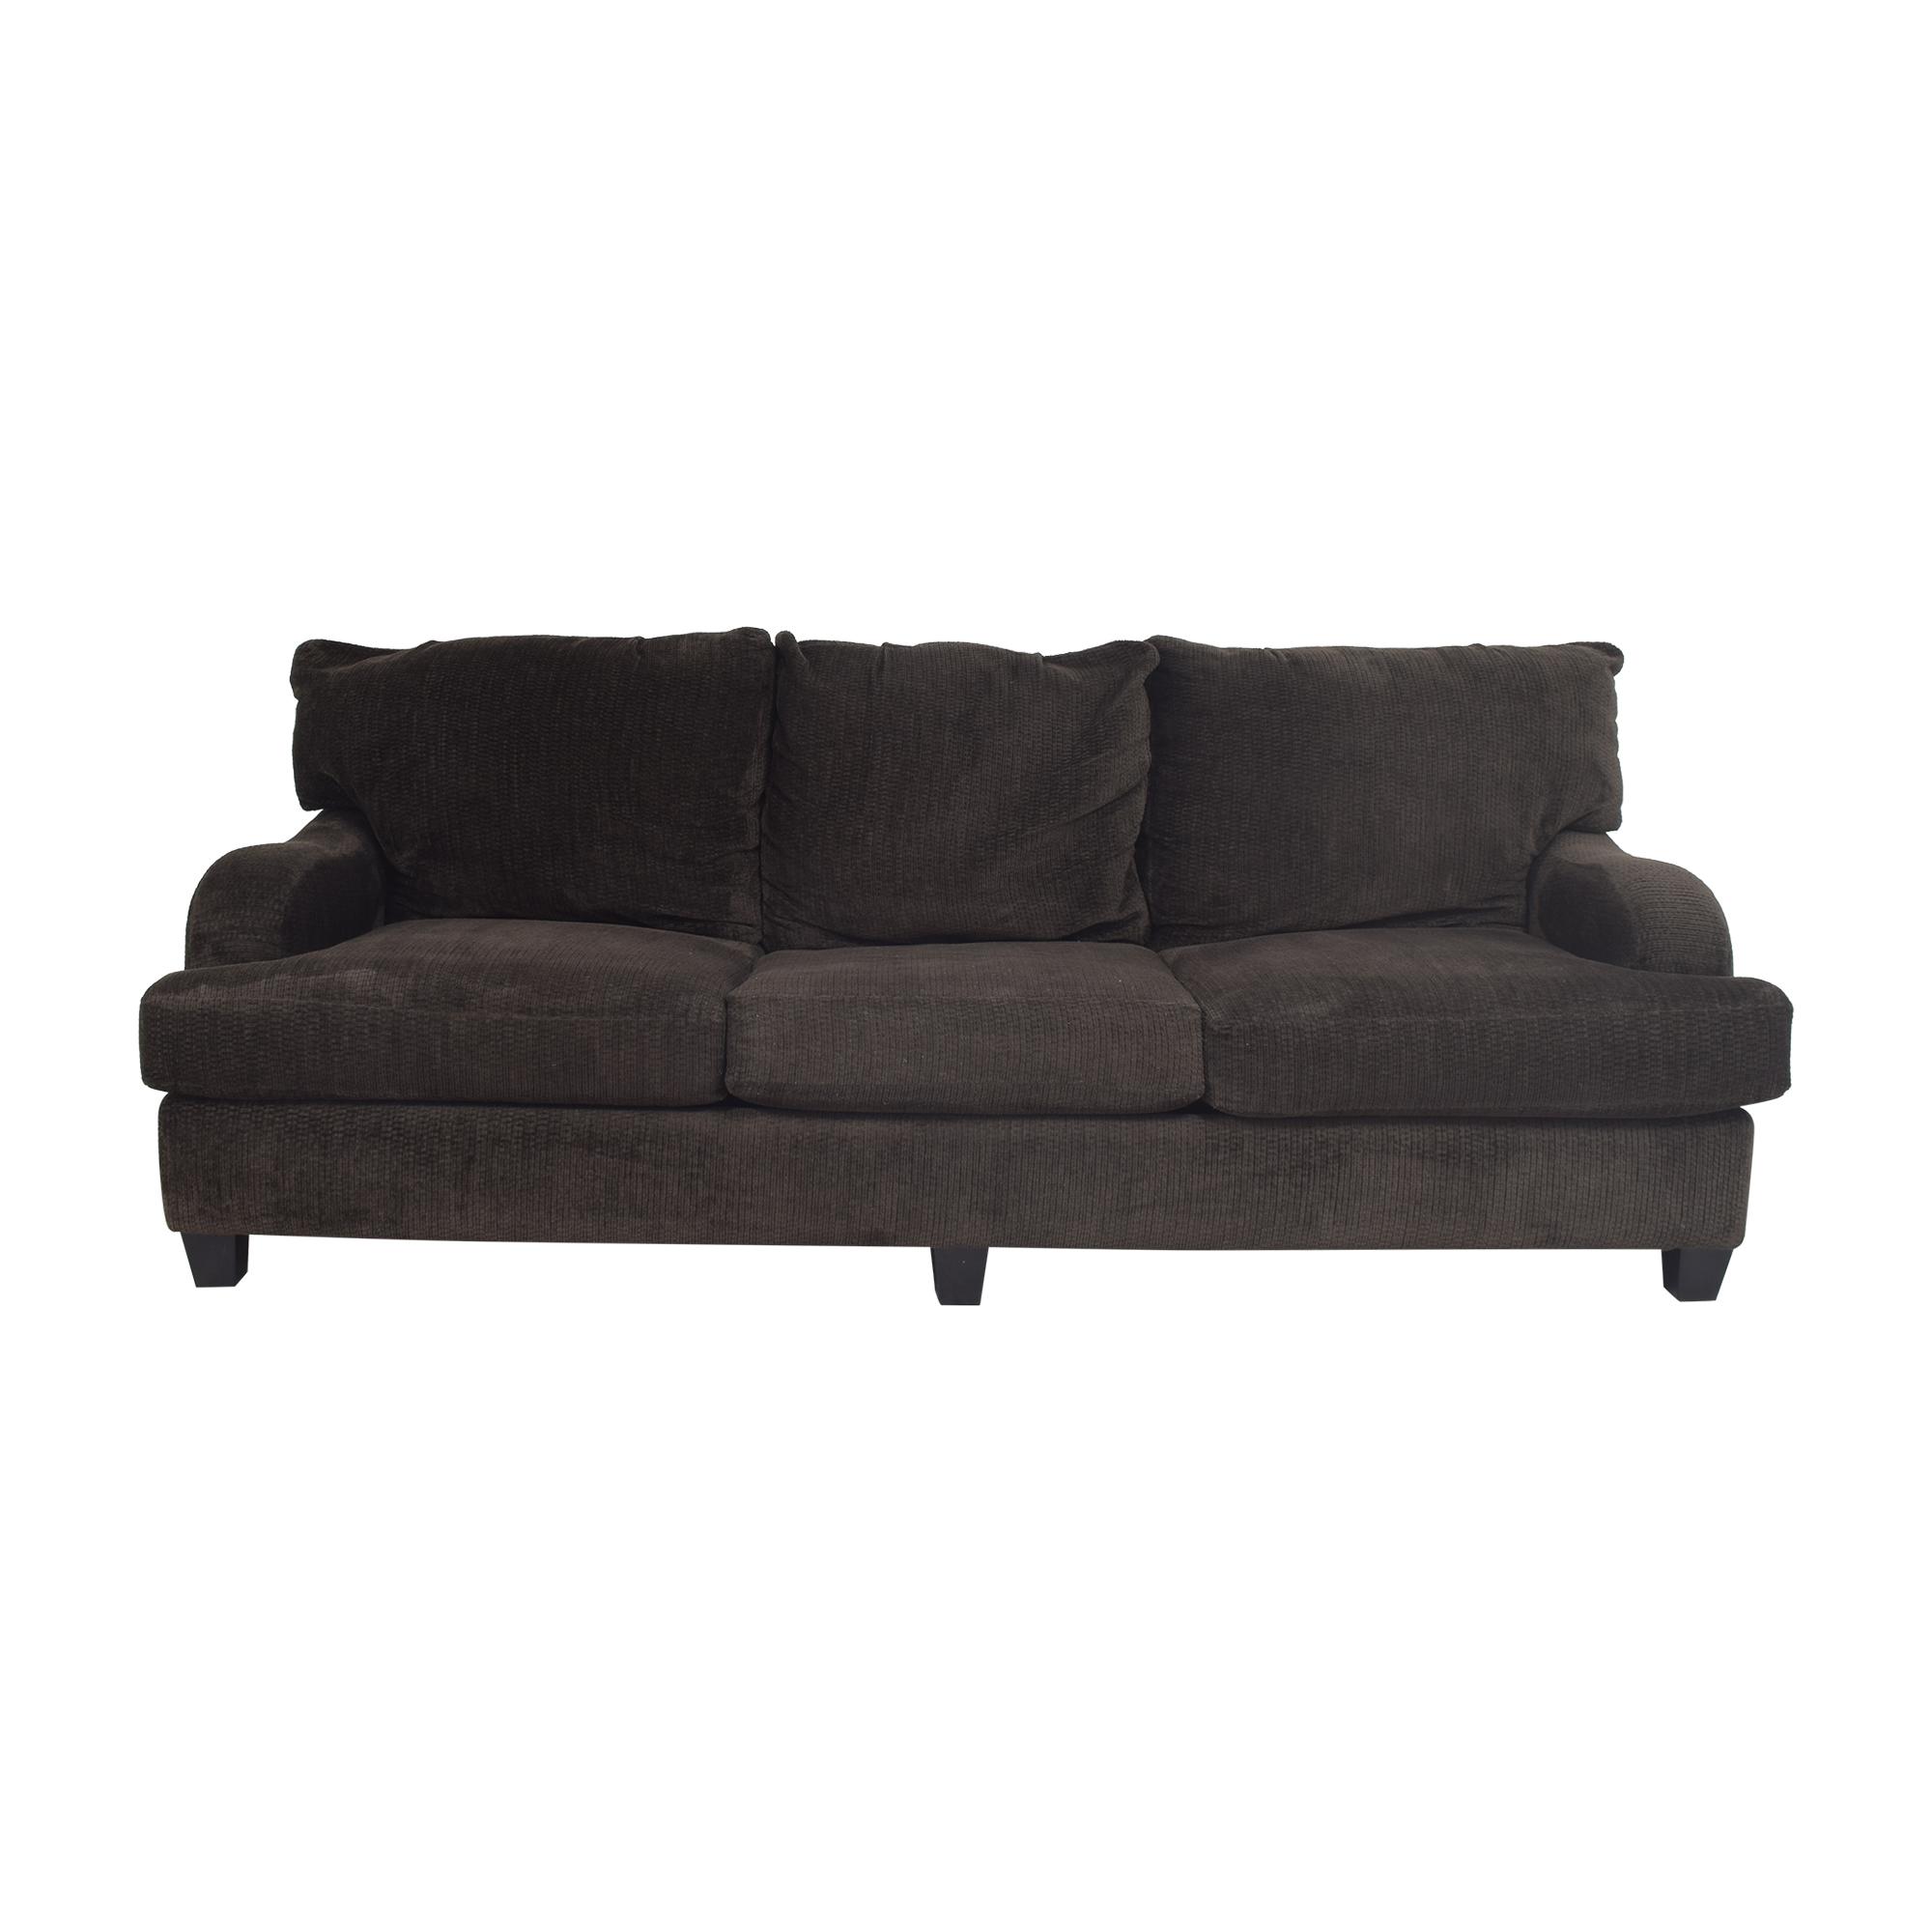 Raymour & Flanigan Raymour & Flanigan Three Cushion Sofa dark brown